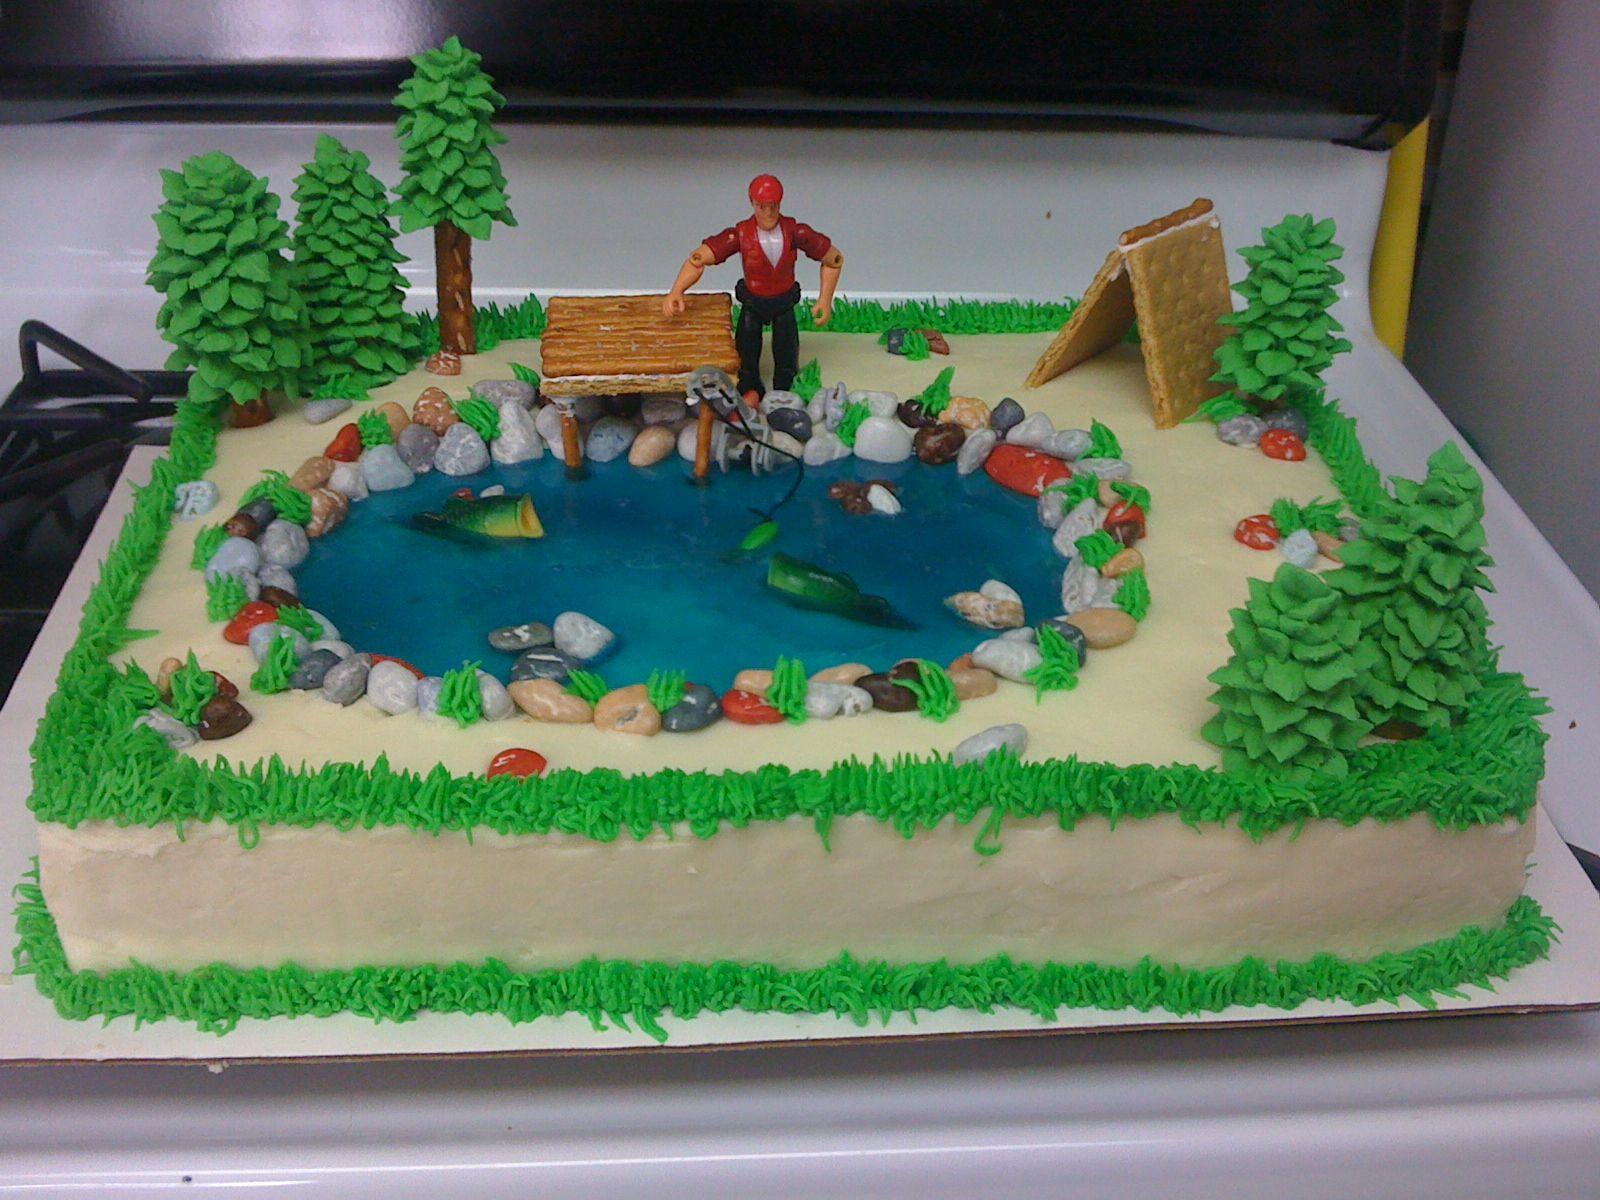 Fishing And Camping Cake Hunting Cake Fish Cake Camping Cakes